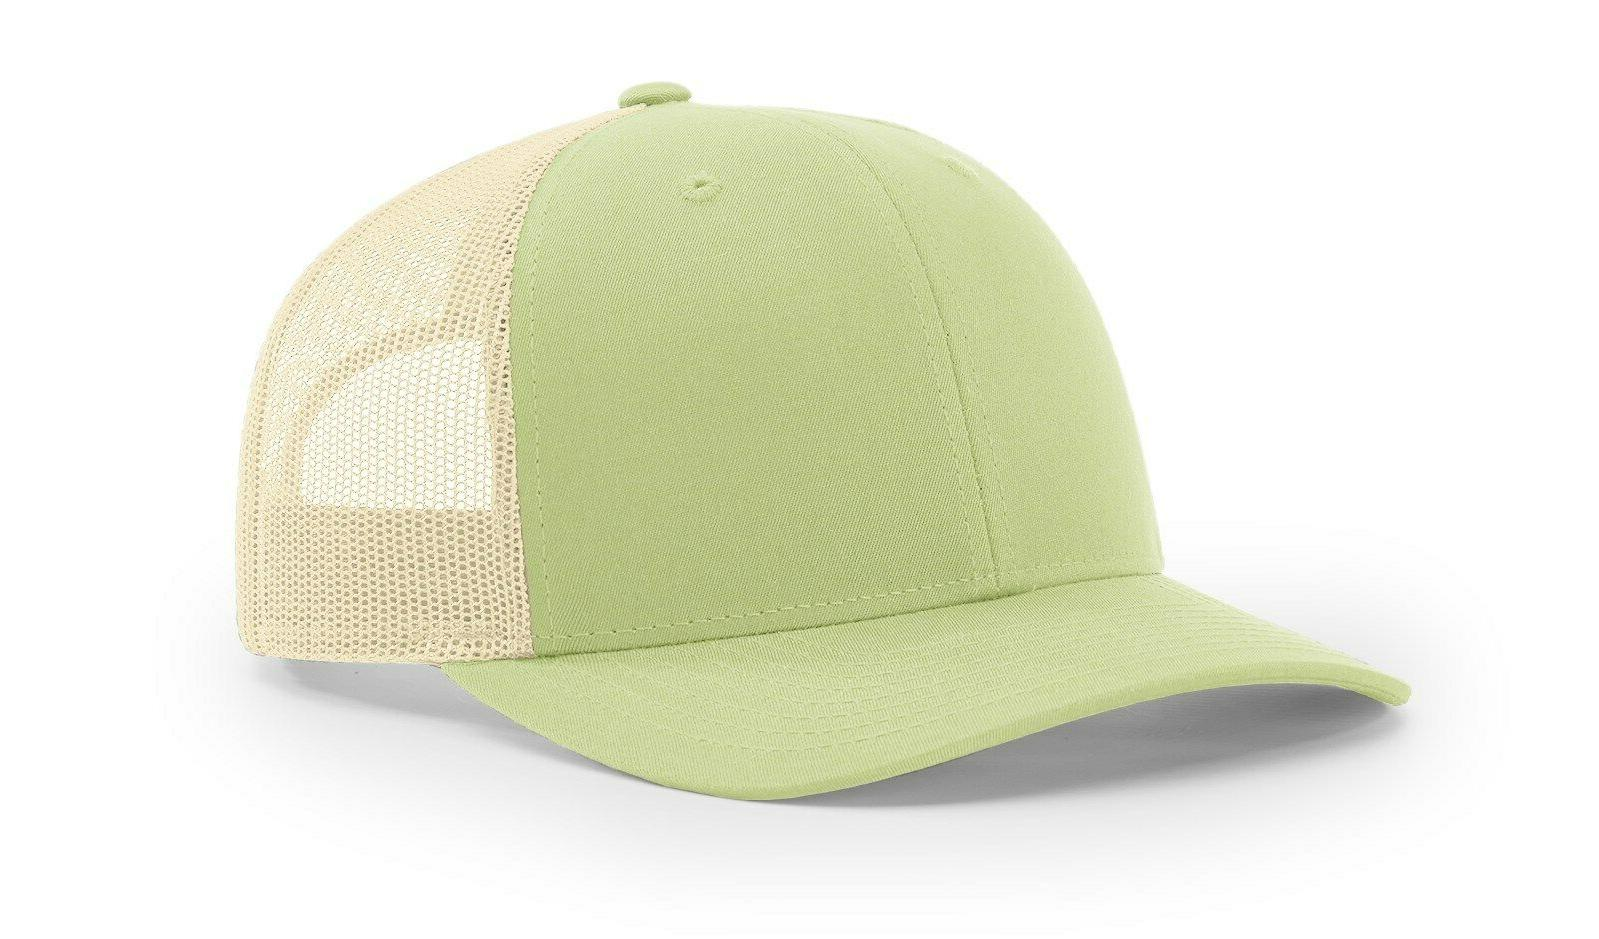 Low Pro Trucker Snapback Ballcap